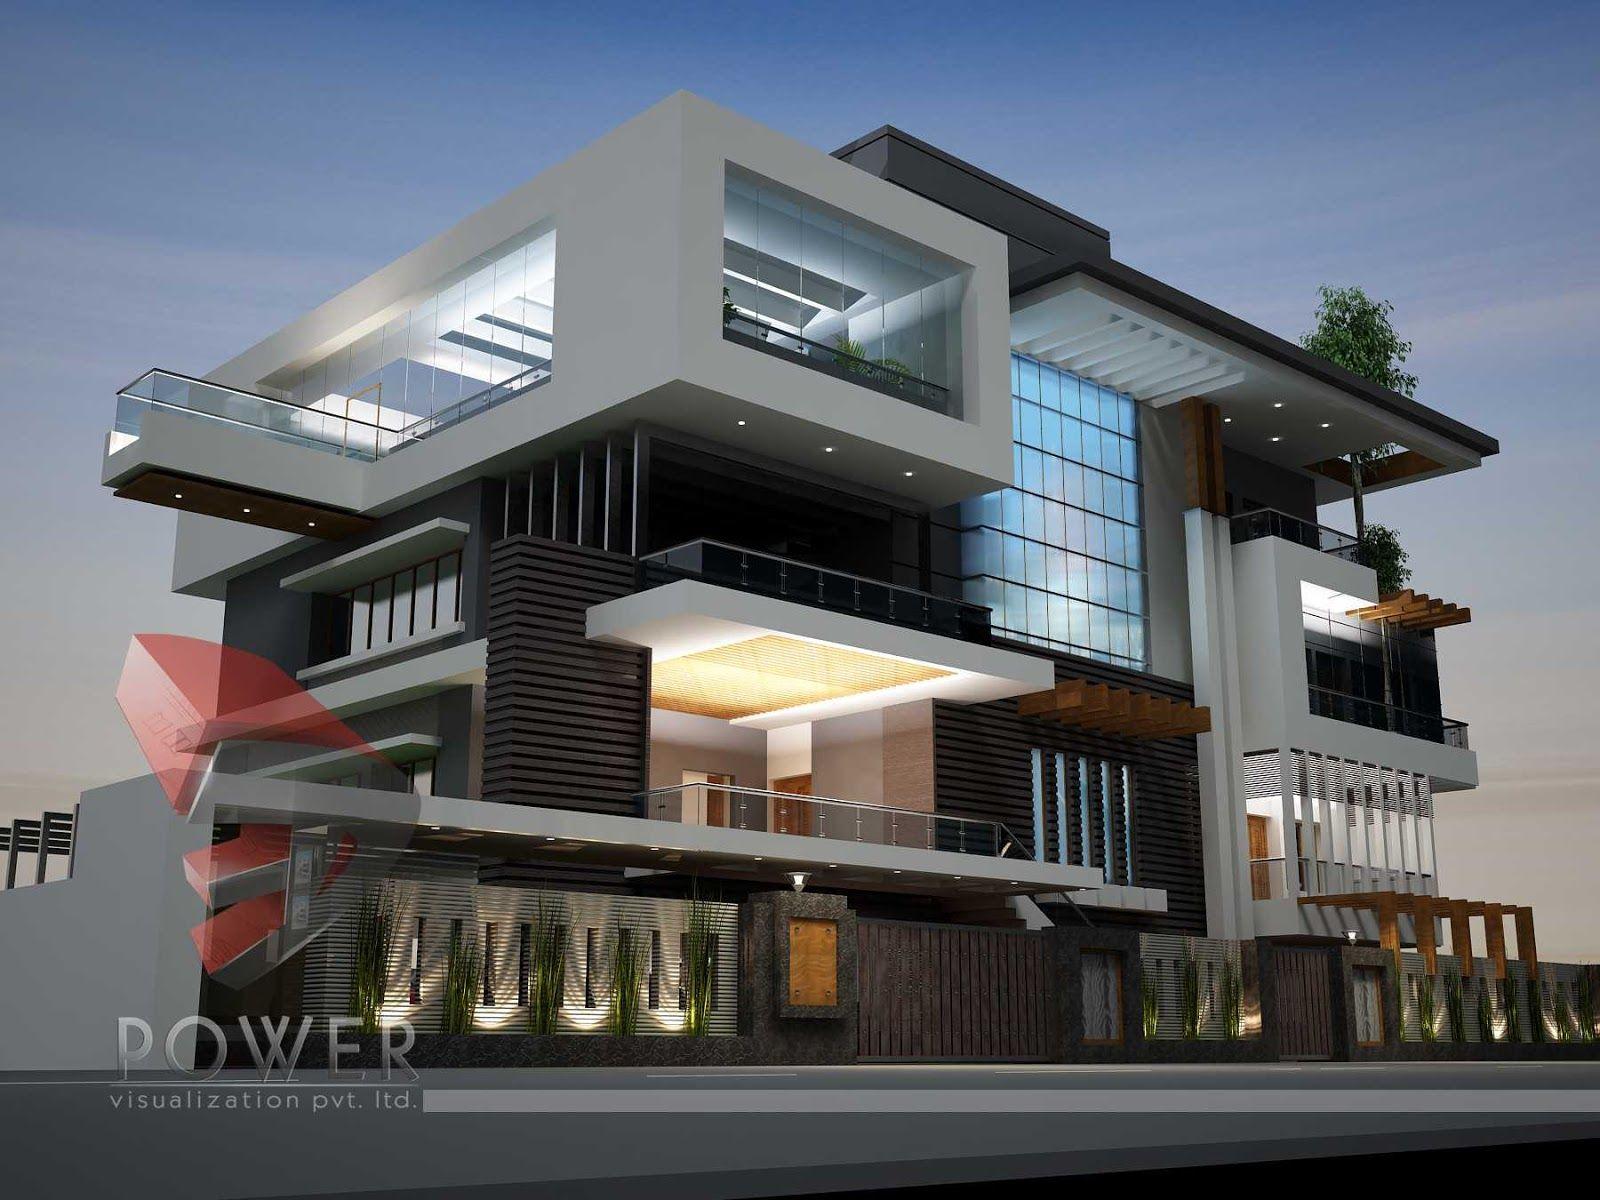 UltraModern House Plans Architect Ultra Modern Home Designs - Home design modern